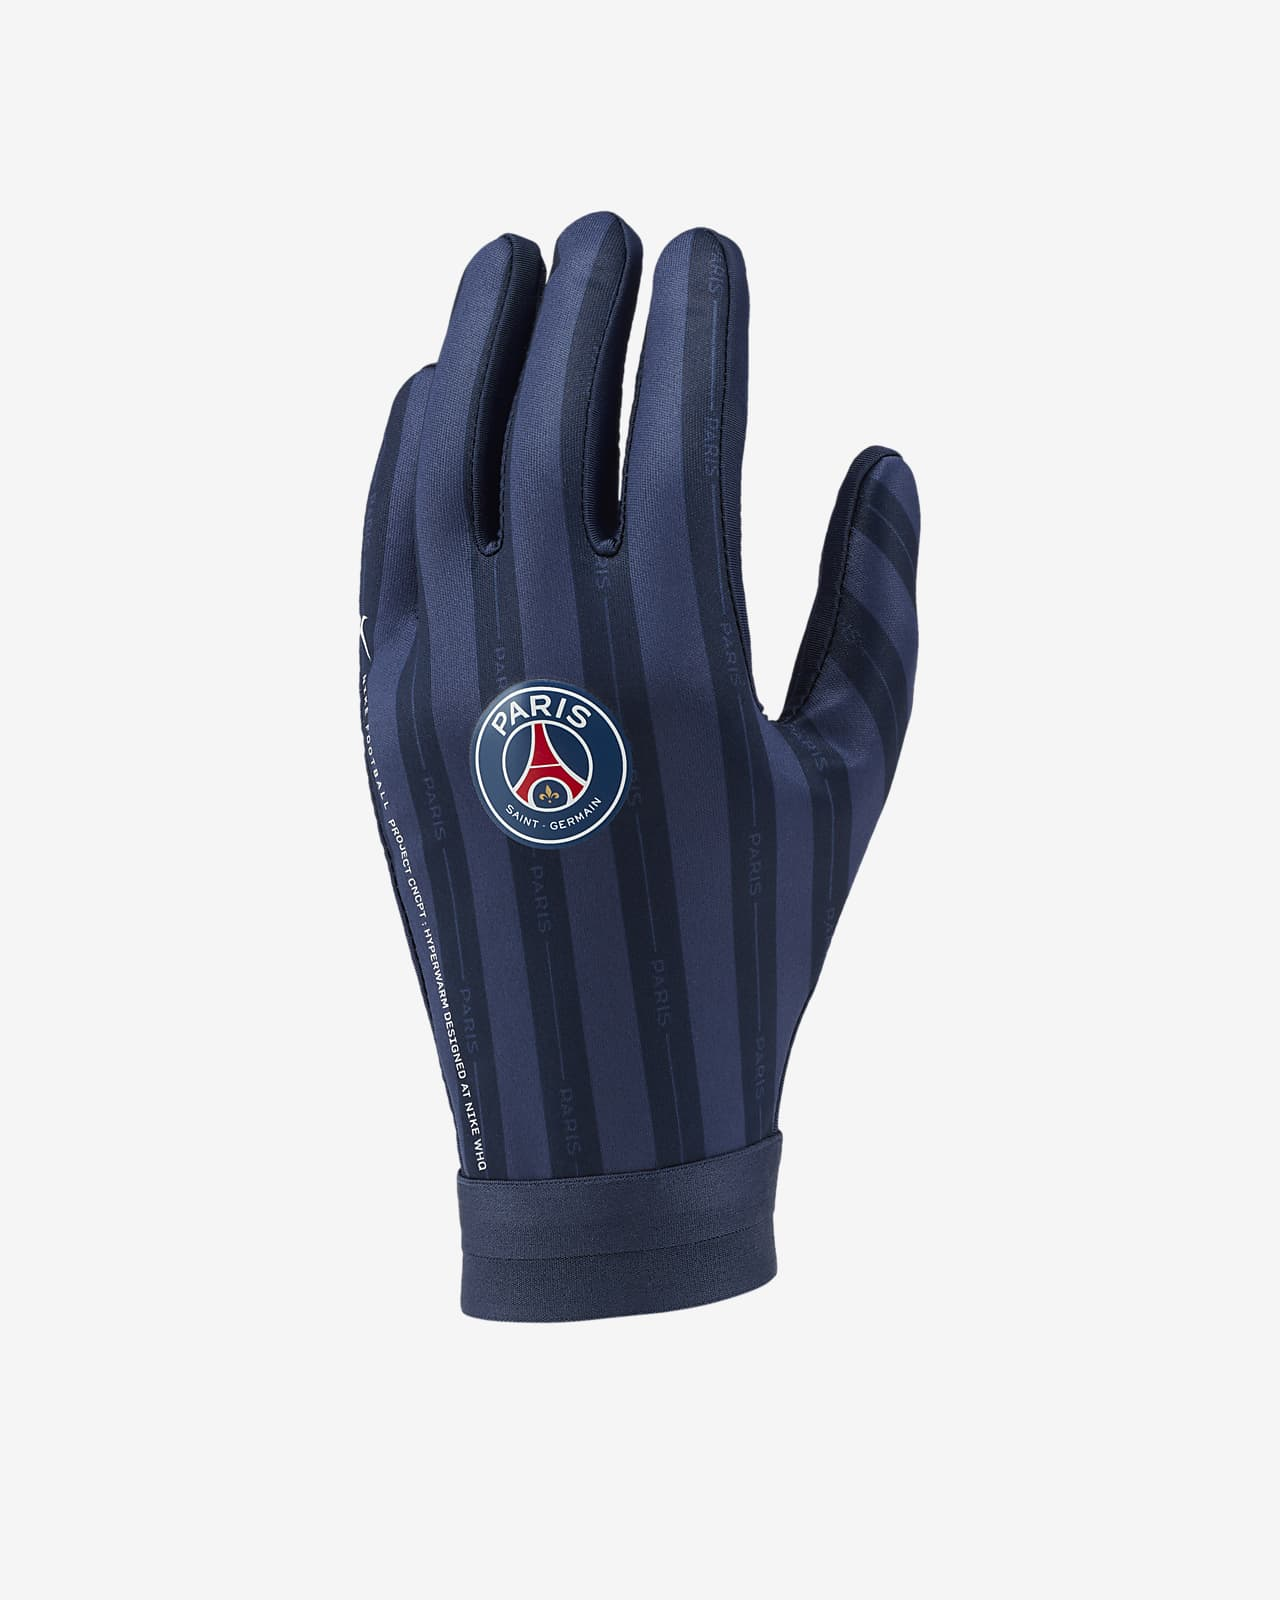 Paris Saint-Germain HyperWarm Academy Football Gloves